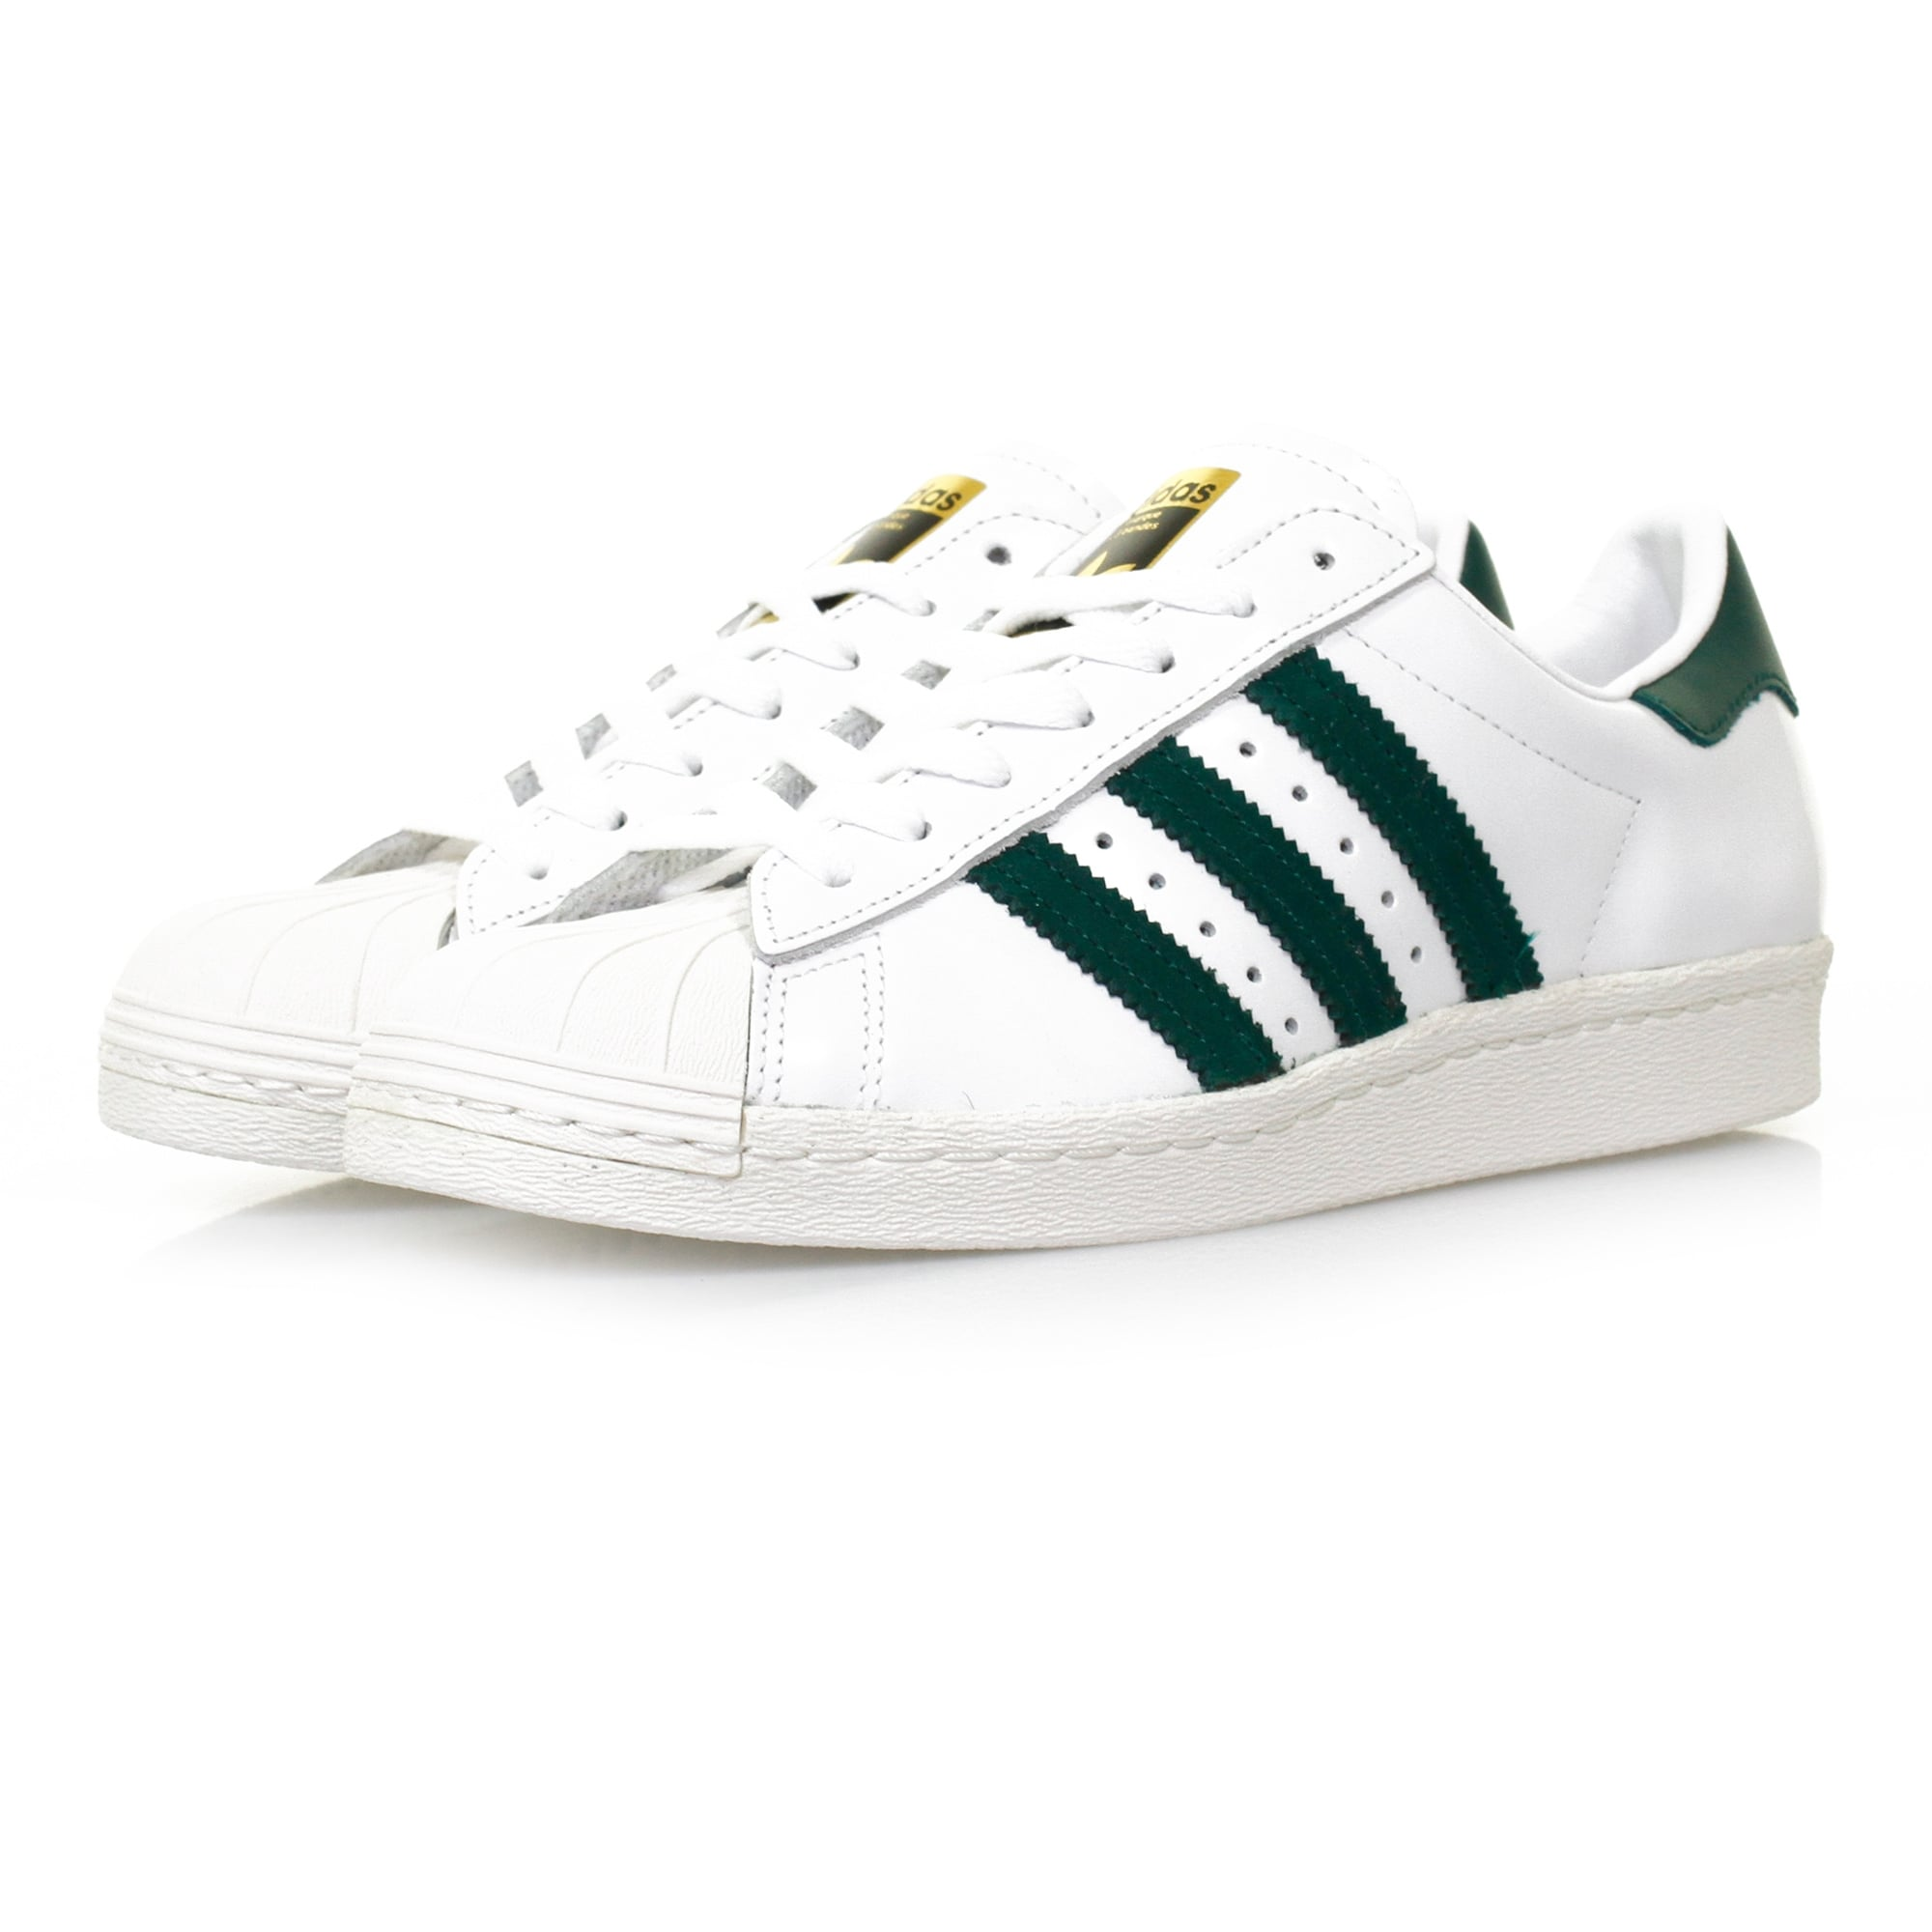 Shoes Like Pottery White